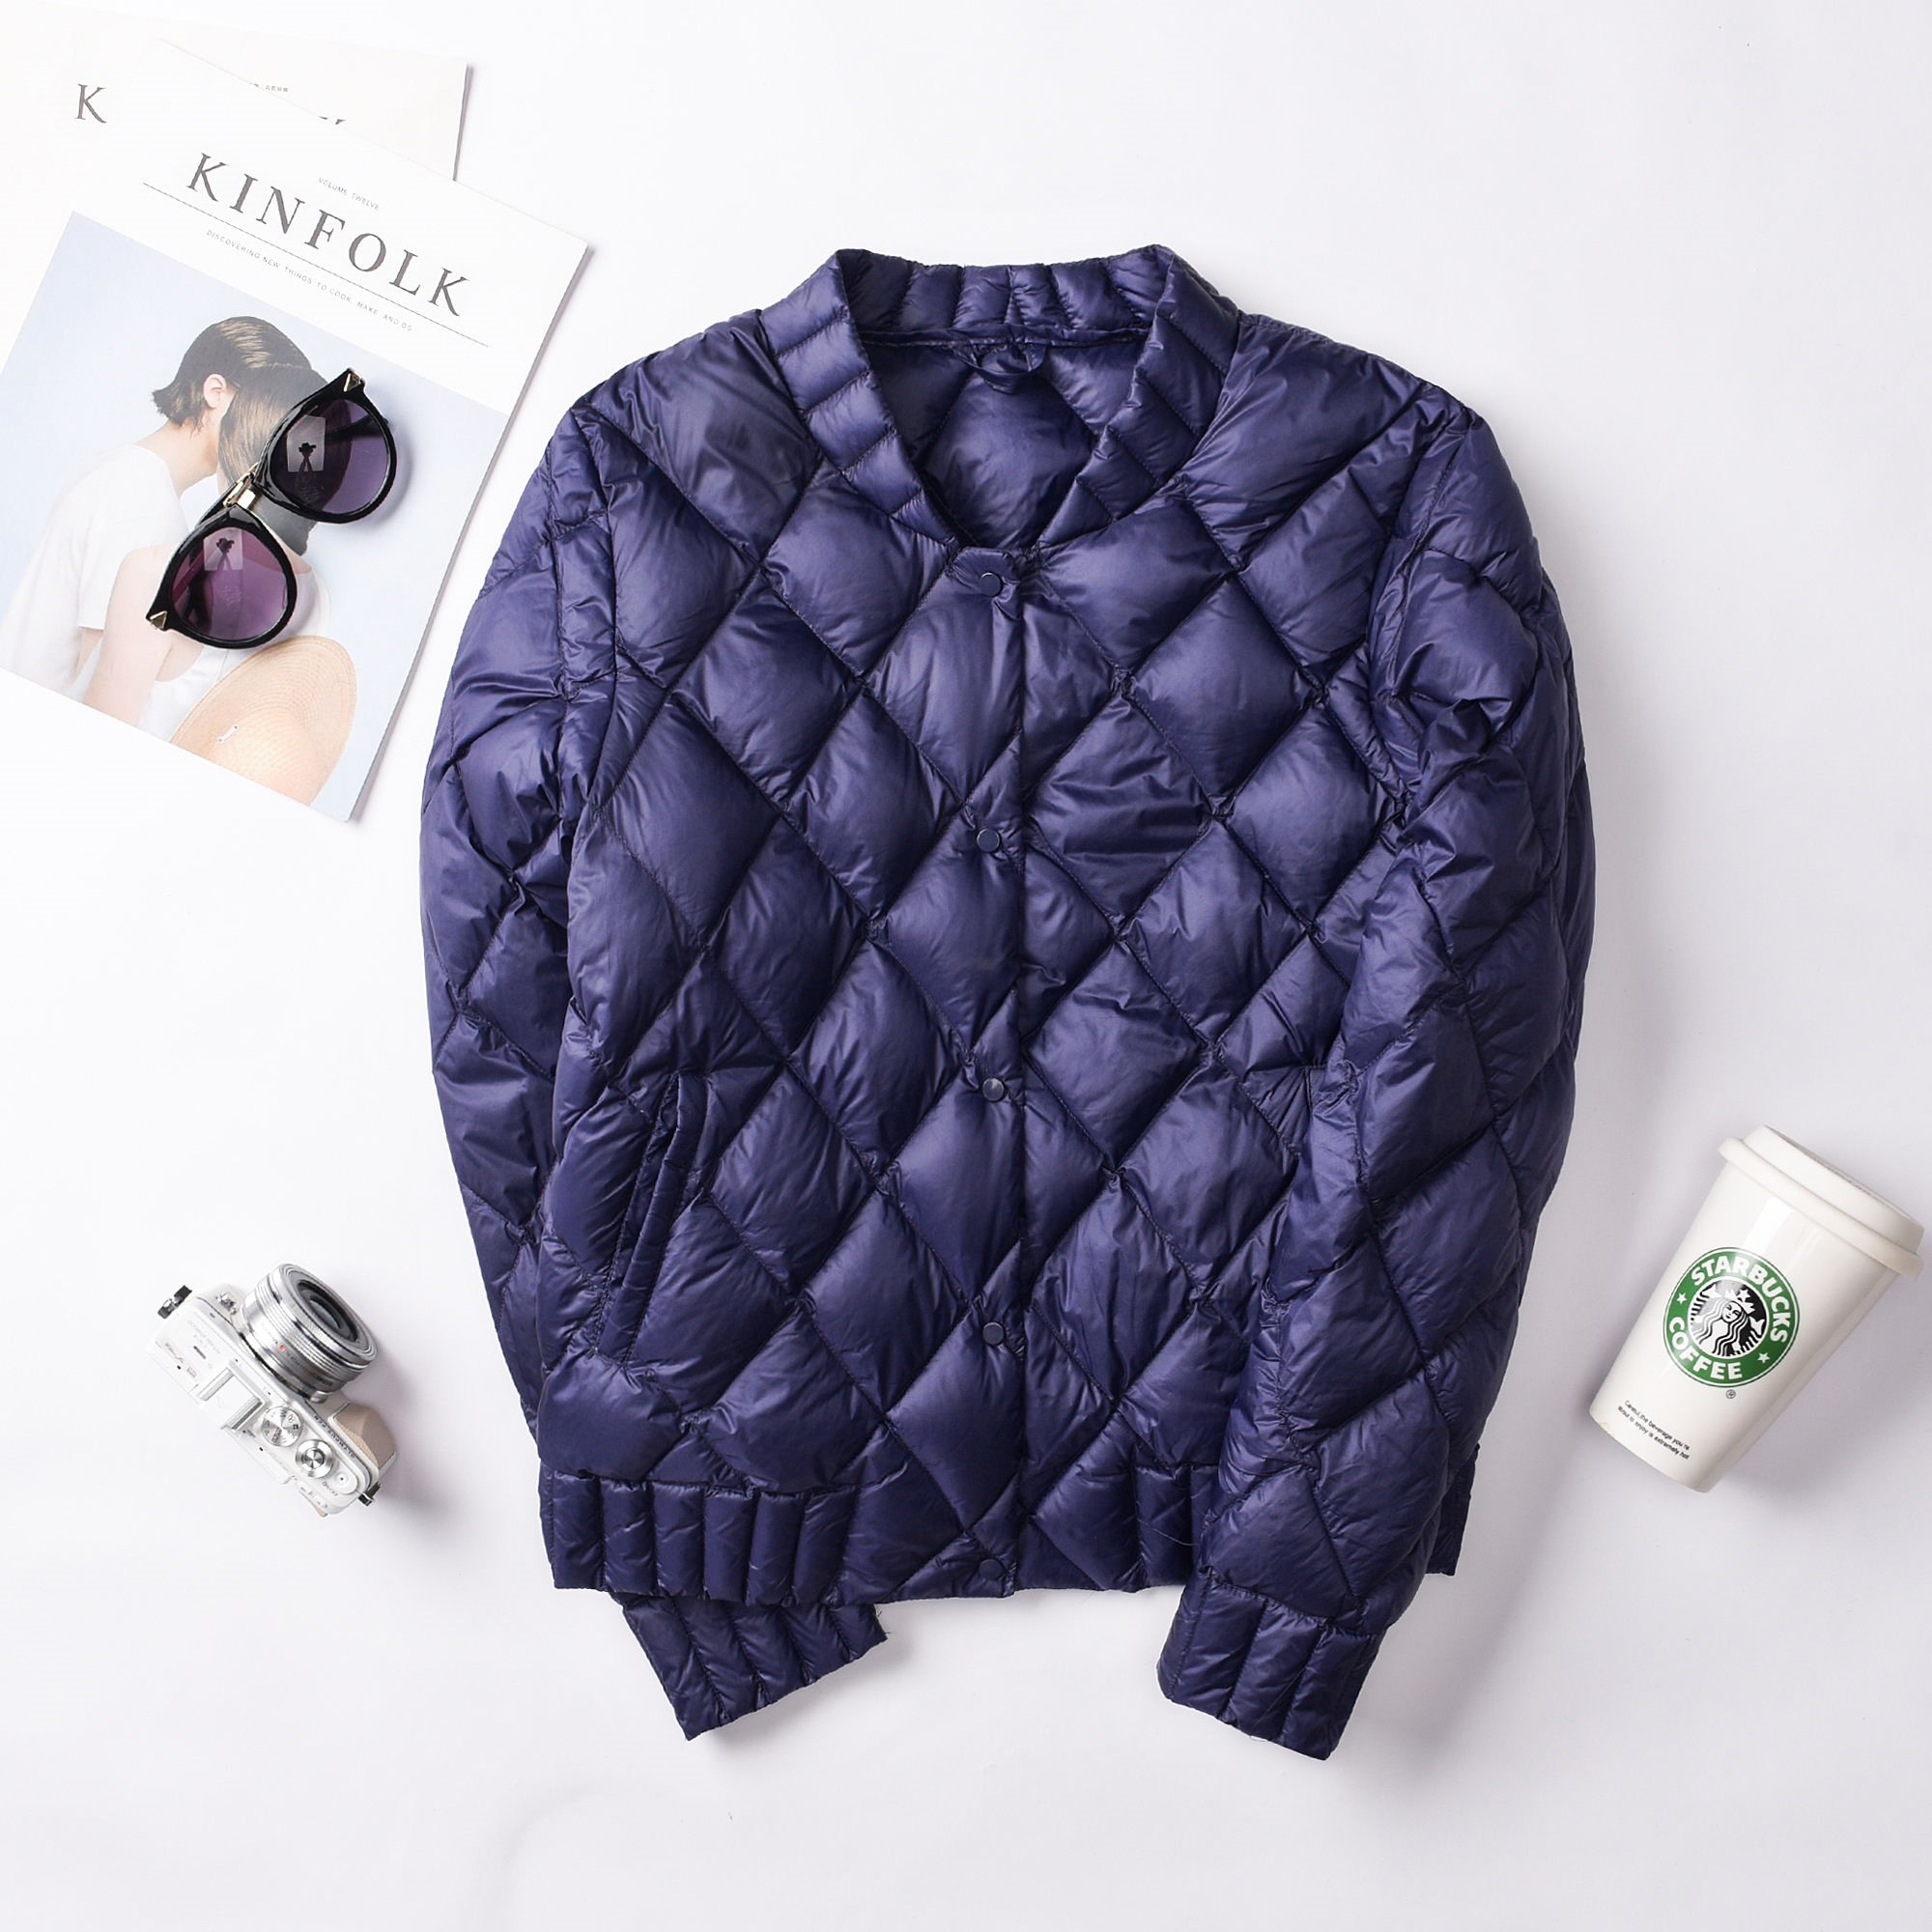 Ailegogo New 2019 Autumn Winter Ultra Light White Duck Down Jackets Women Plus Size 3XL O Neck Coat Slim Short Warm Down Coats